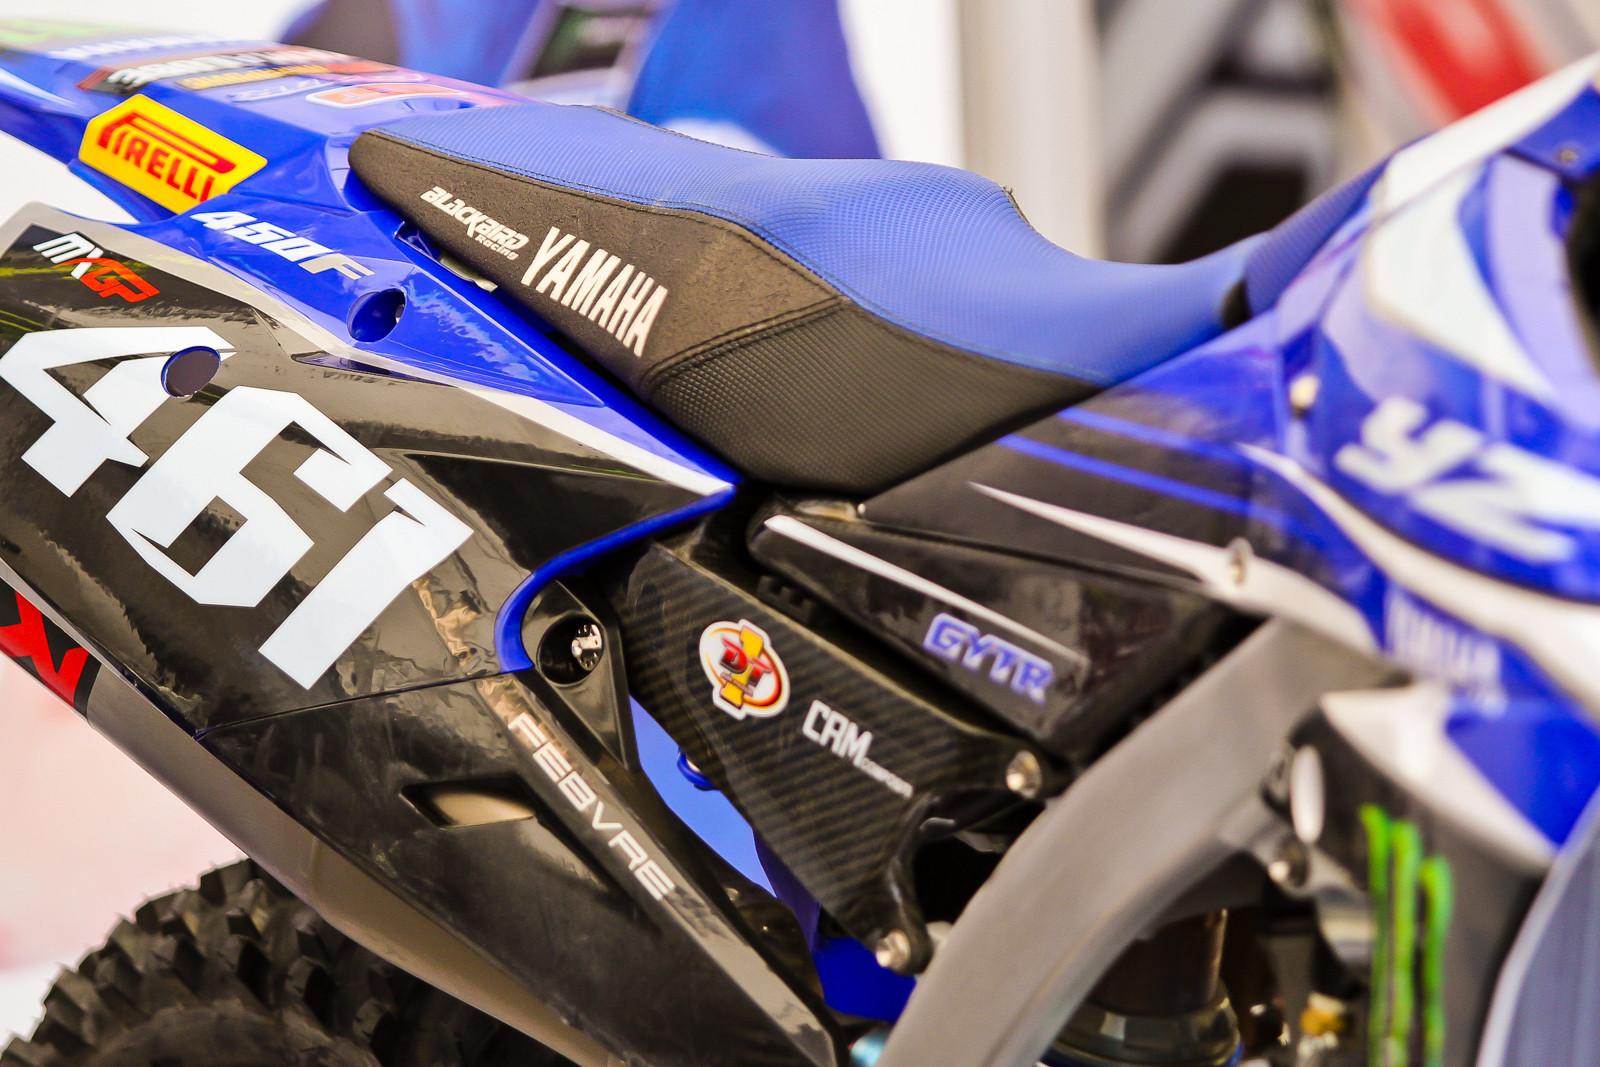 Romain Febvre's Seat - Vital MX Pit Bits: 2017 MXGP of Valkenswaard - Motocross Pictures - Vital MX